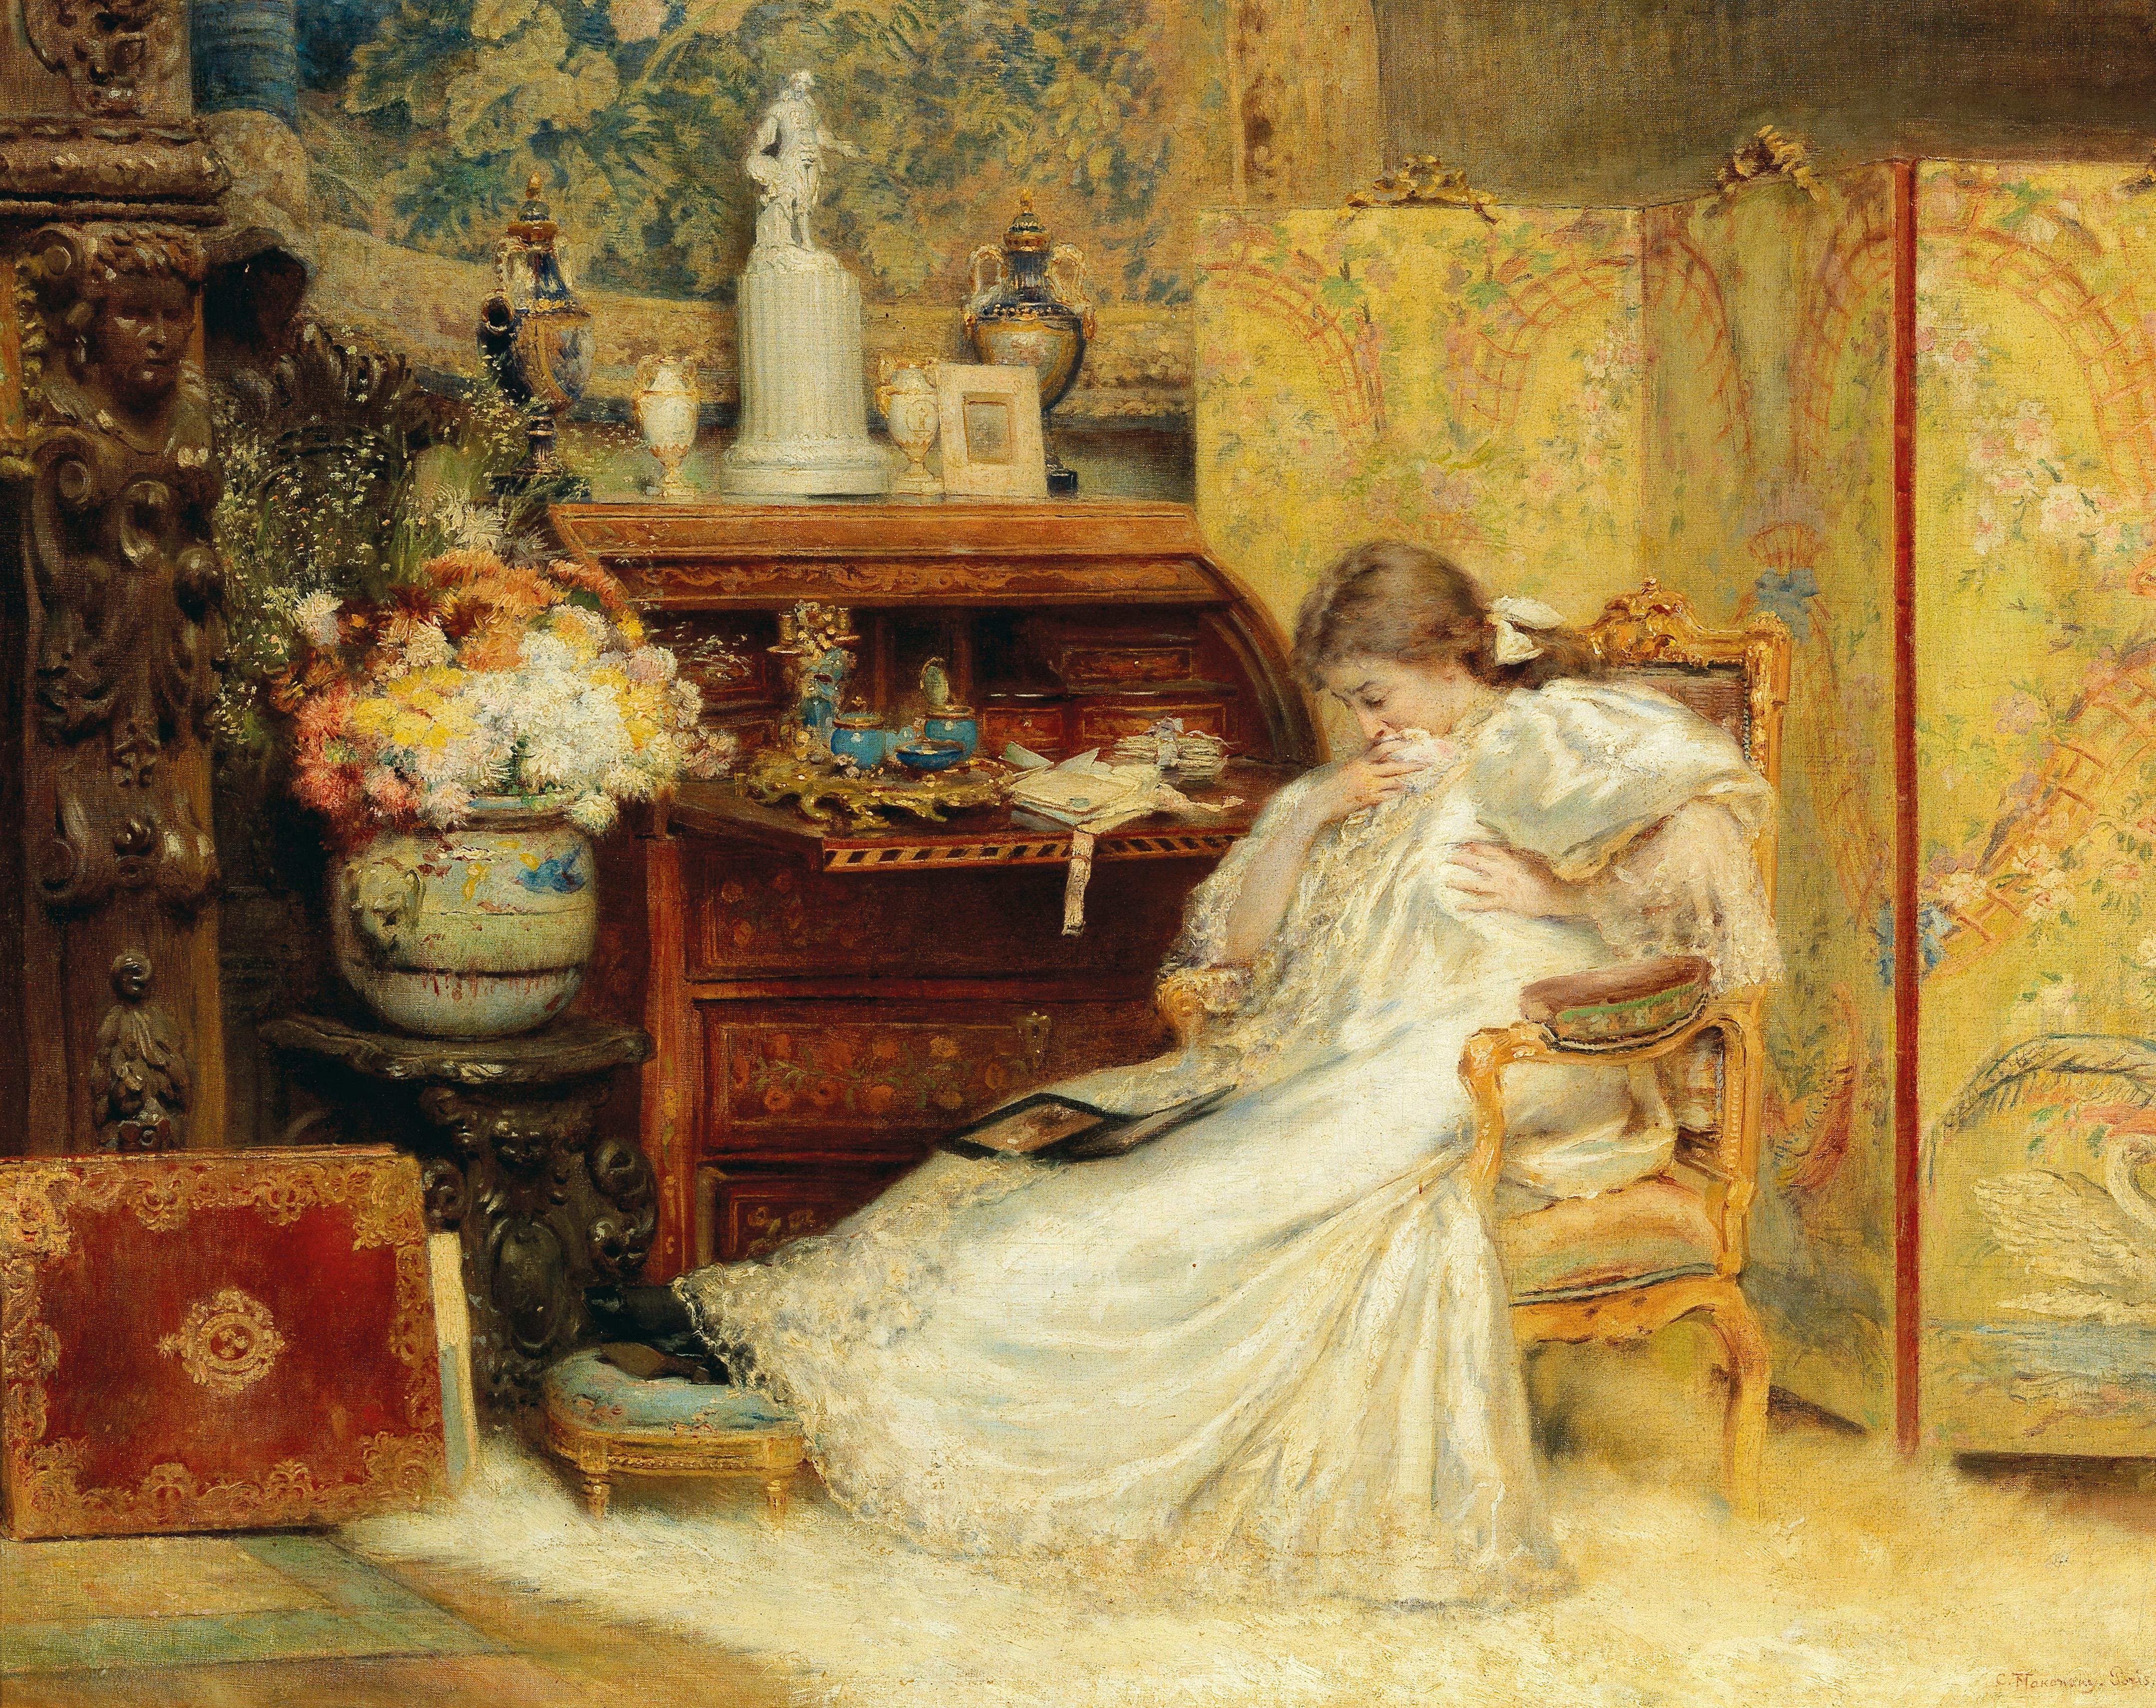 Konstantin Yegorovich Makovsky (1839–1915) Gentle creature oil on canvas, 71 x 90 cm estimate € 70,000 – 90,000